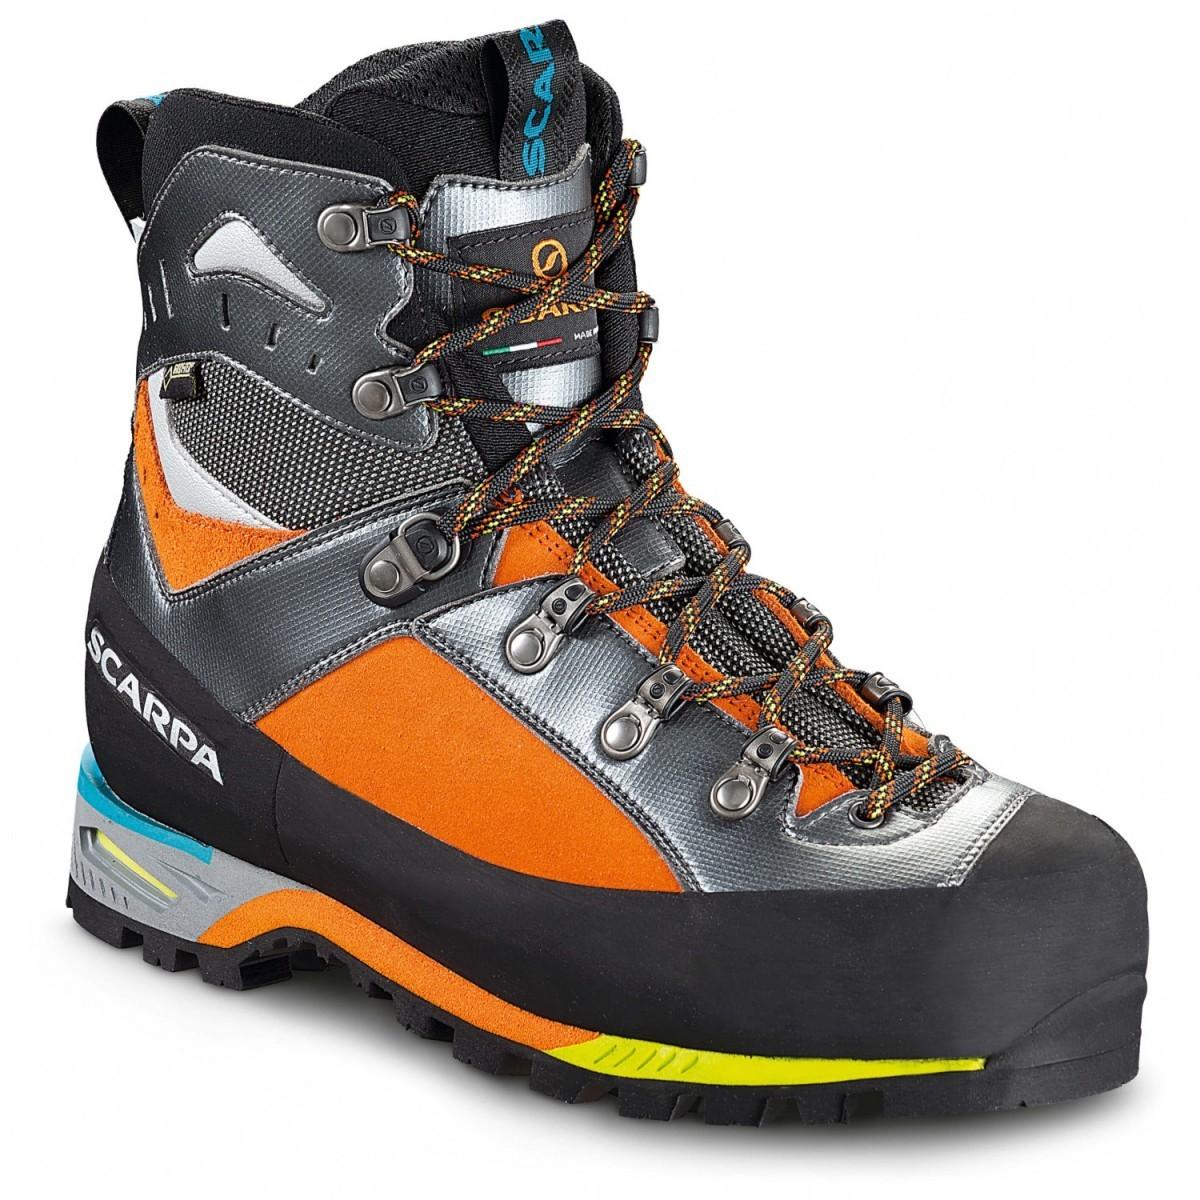 Scarpa スカルパ Triolet GTX ( Tonic ) ★ 登山靴 ・ 靴 ・ 登山 ・ アウトドアシューズ ・ 山歩き ★